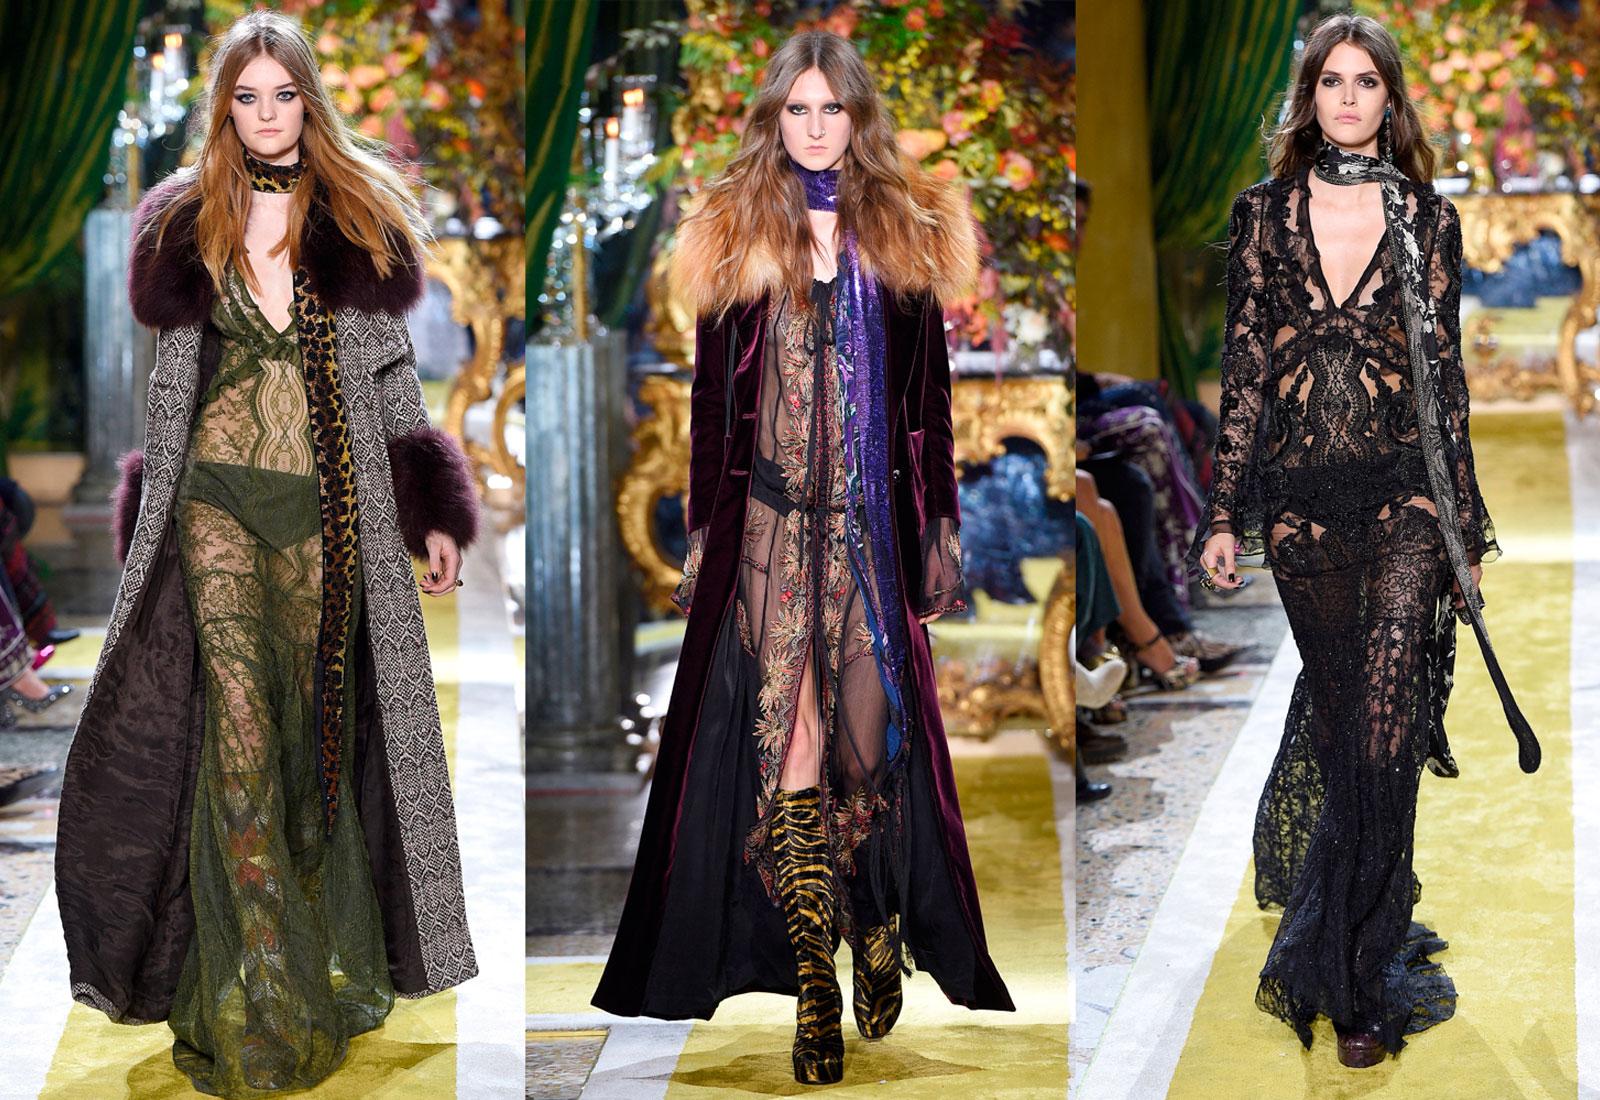 roberto cavalli aw16/17 fashion show vampire inspired looks 1600 x 1100